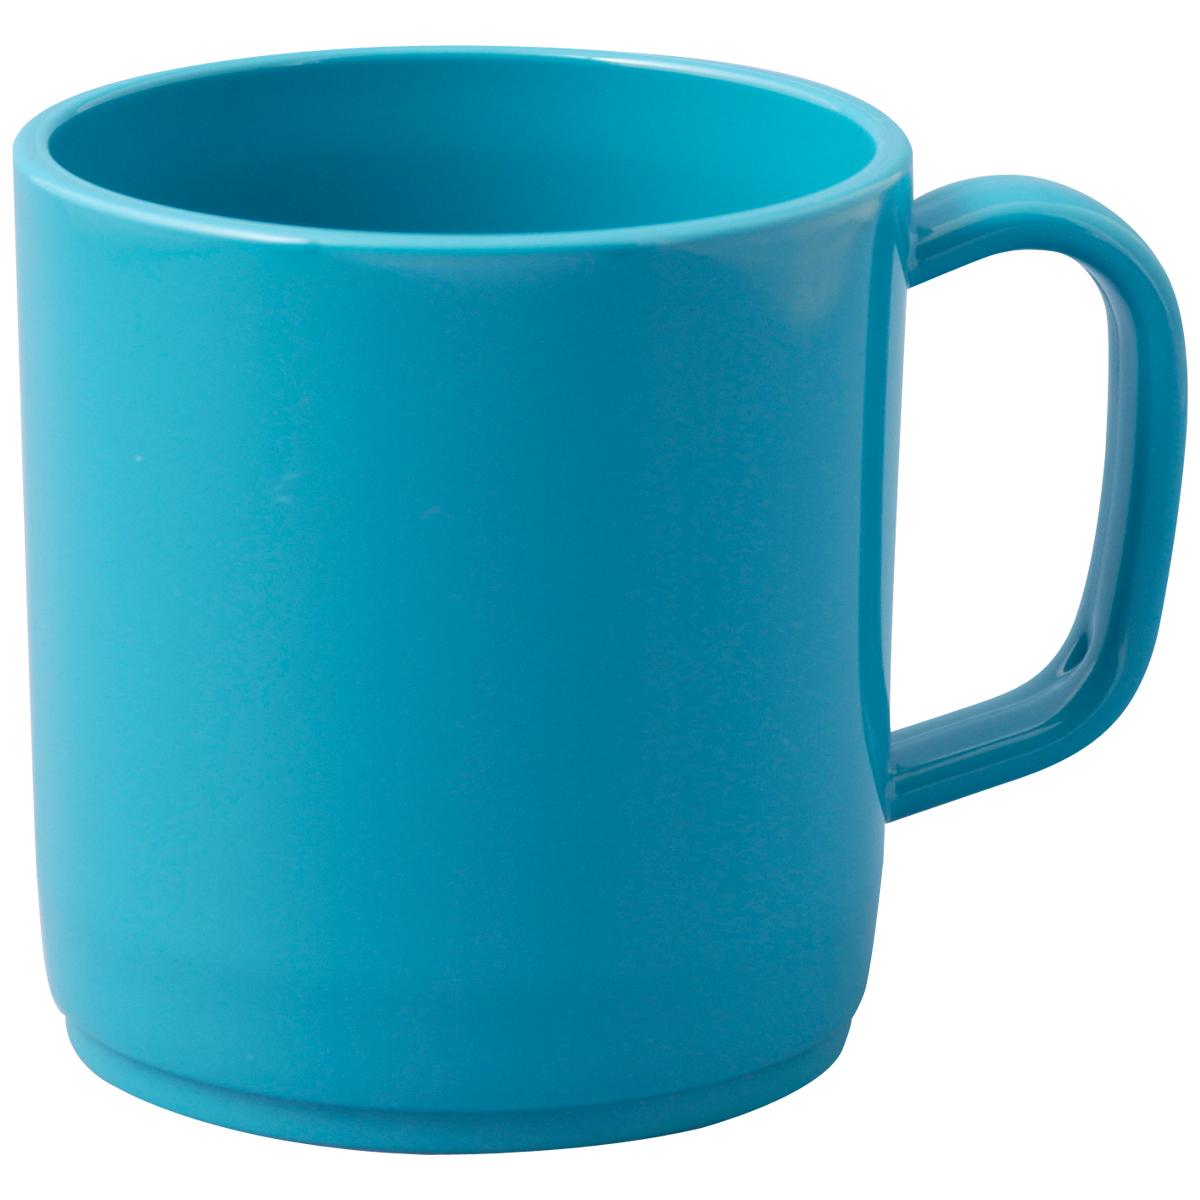 Printed Unbreakable Plastic Mug only £1 01 | Printkick com